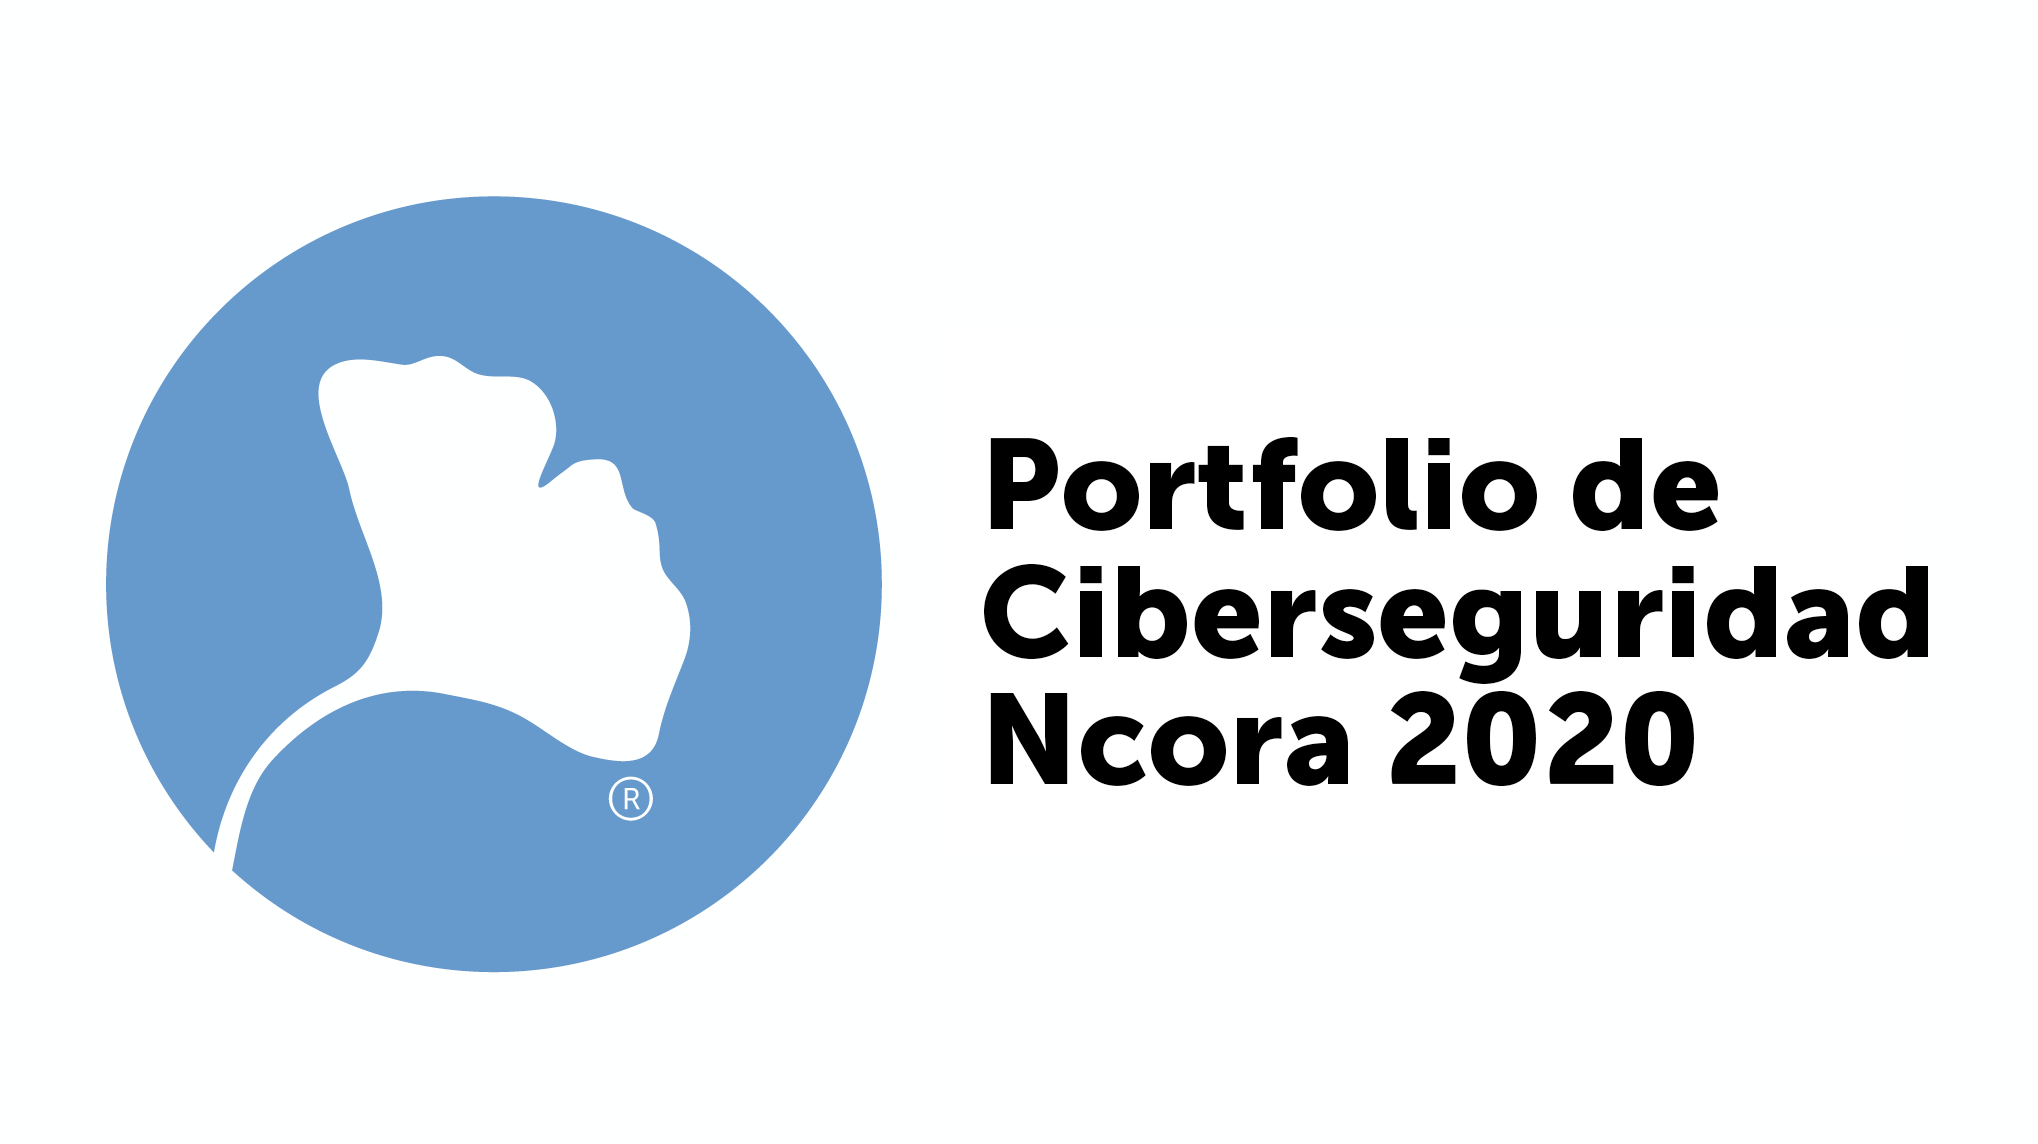 Portfolio ciberseguridad Ncora 2020